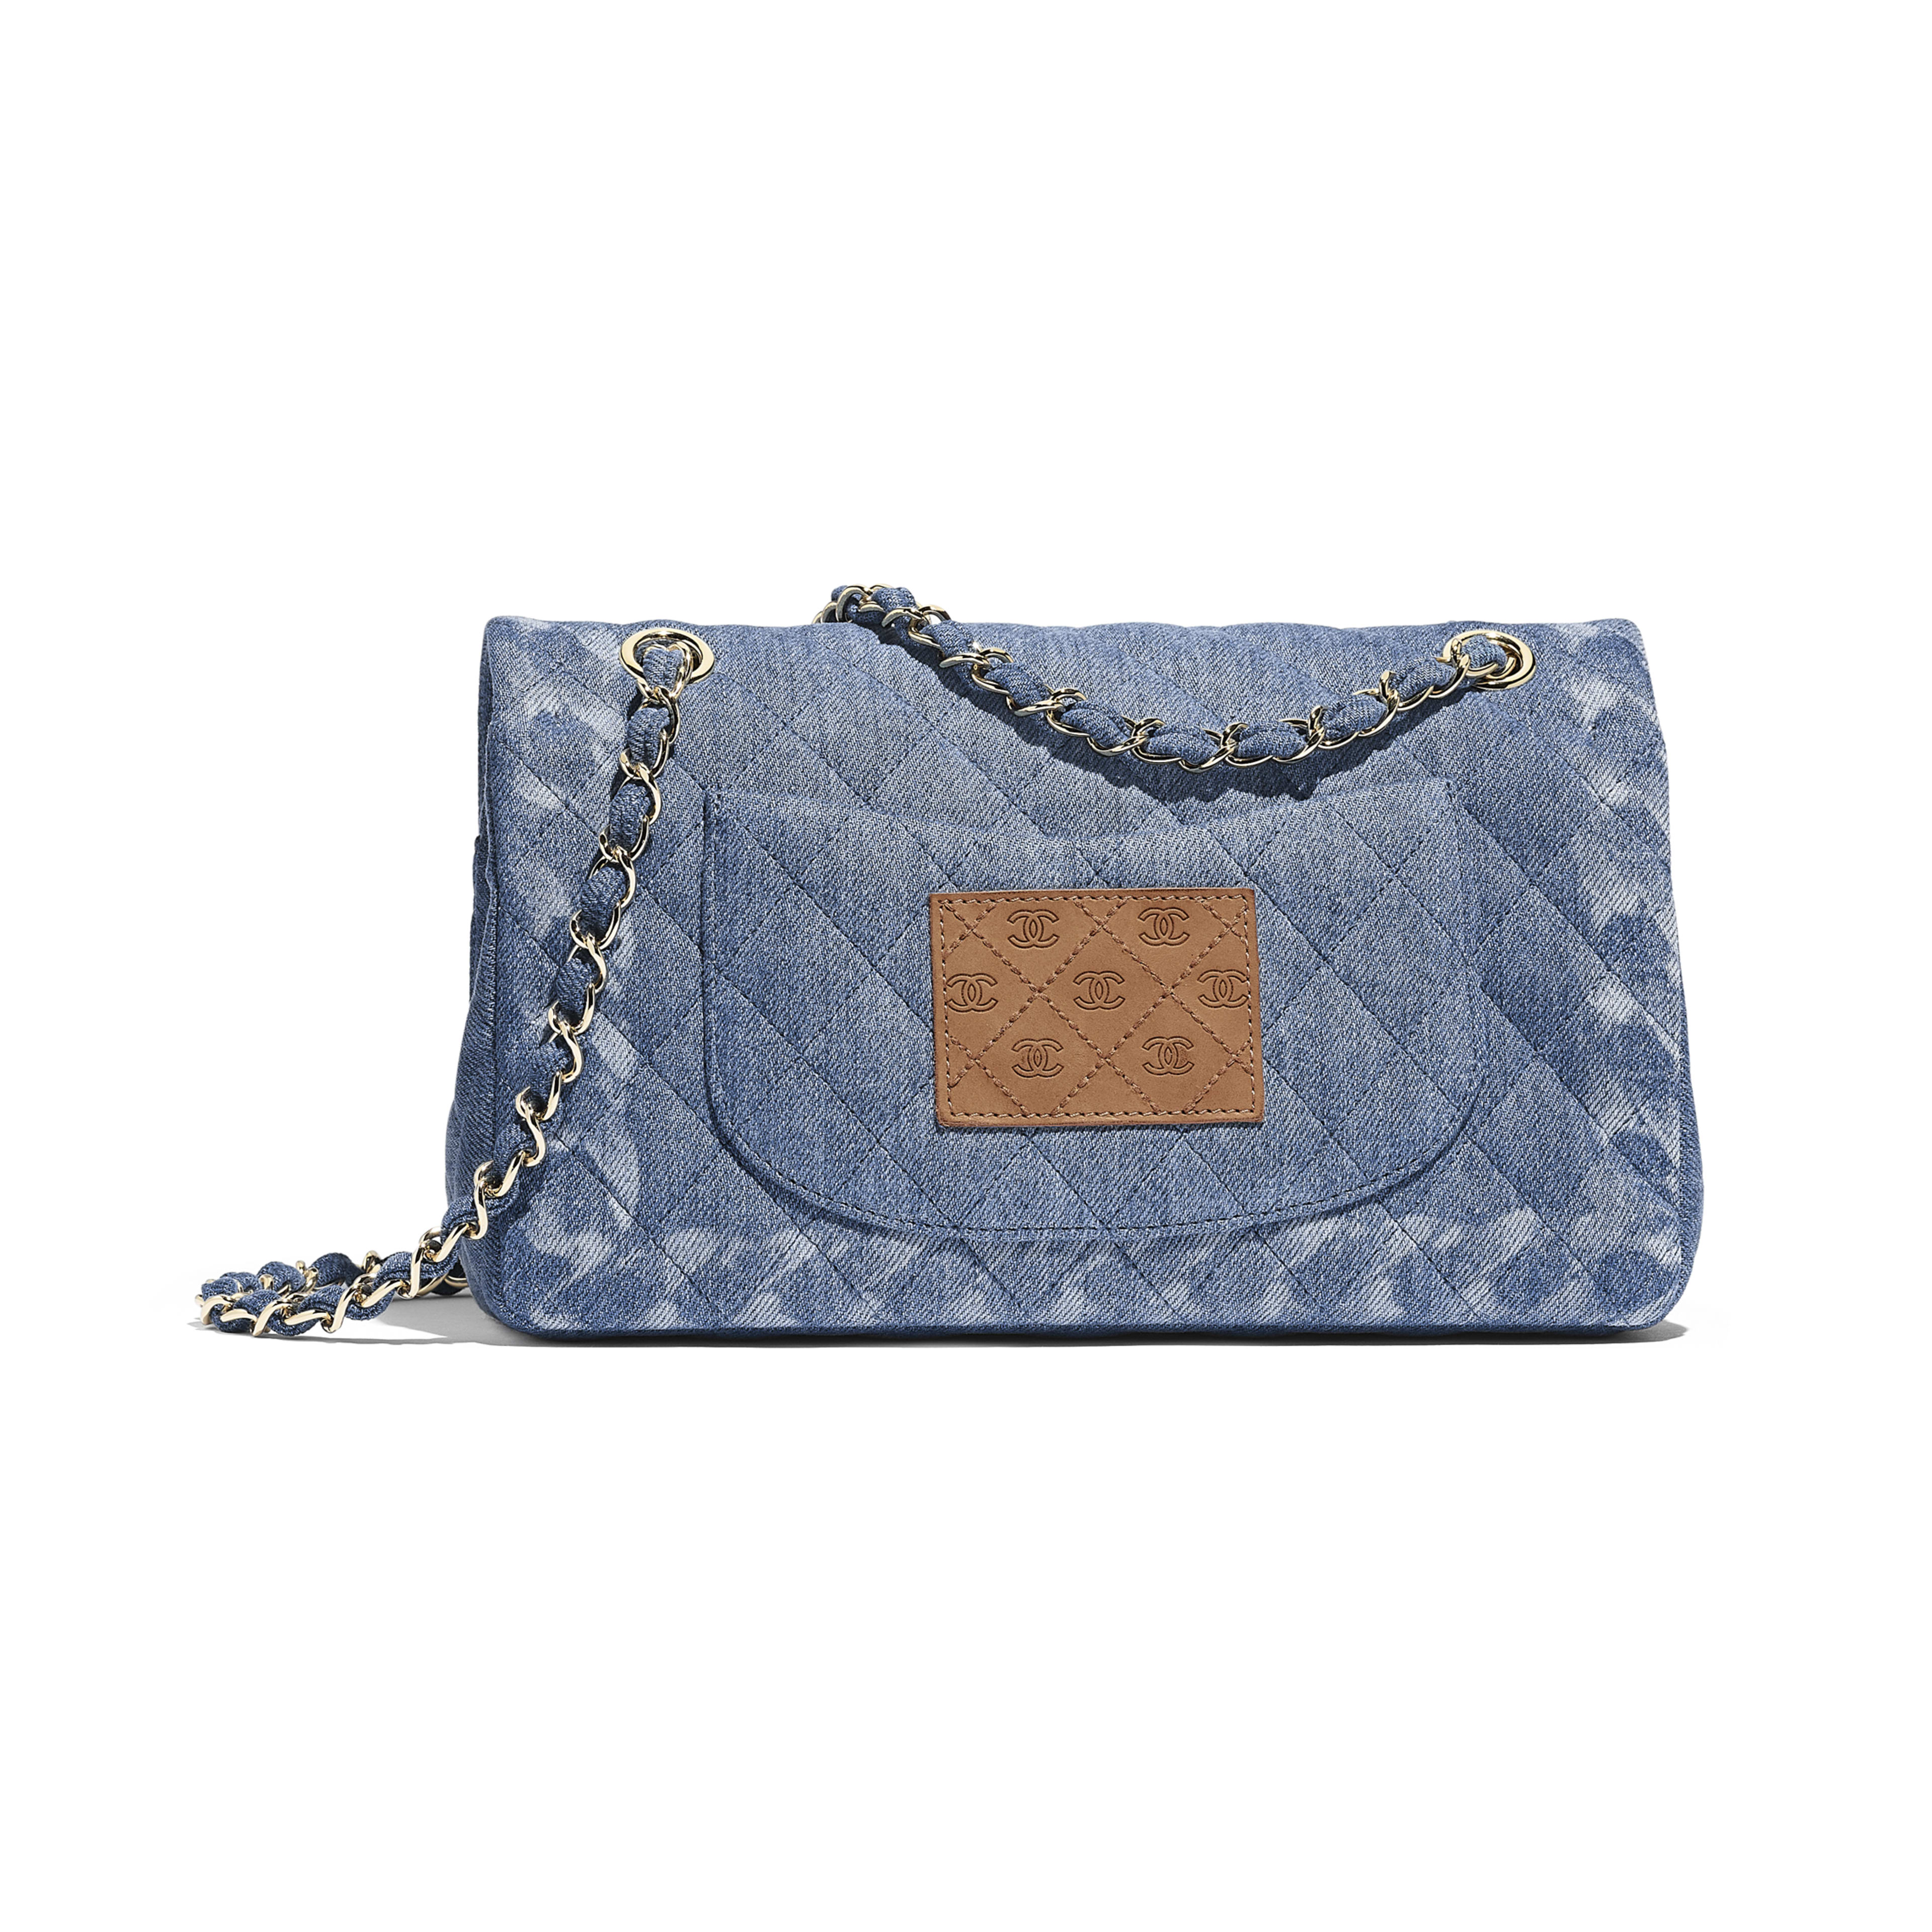 Classic Handbag - Blue - Denim & Gold-Tone Metal - Alternative view - see full sized version